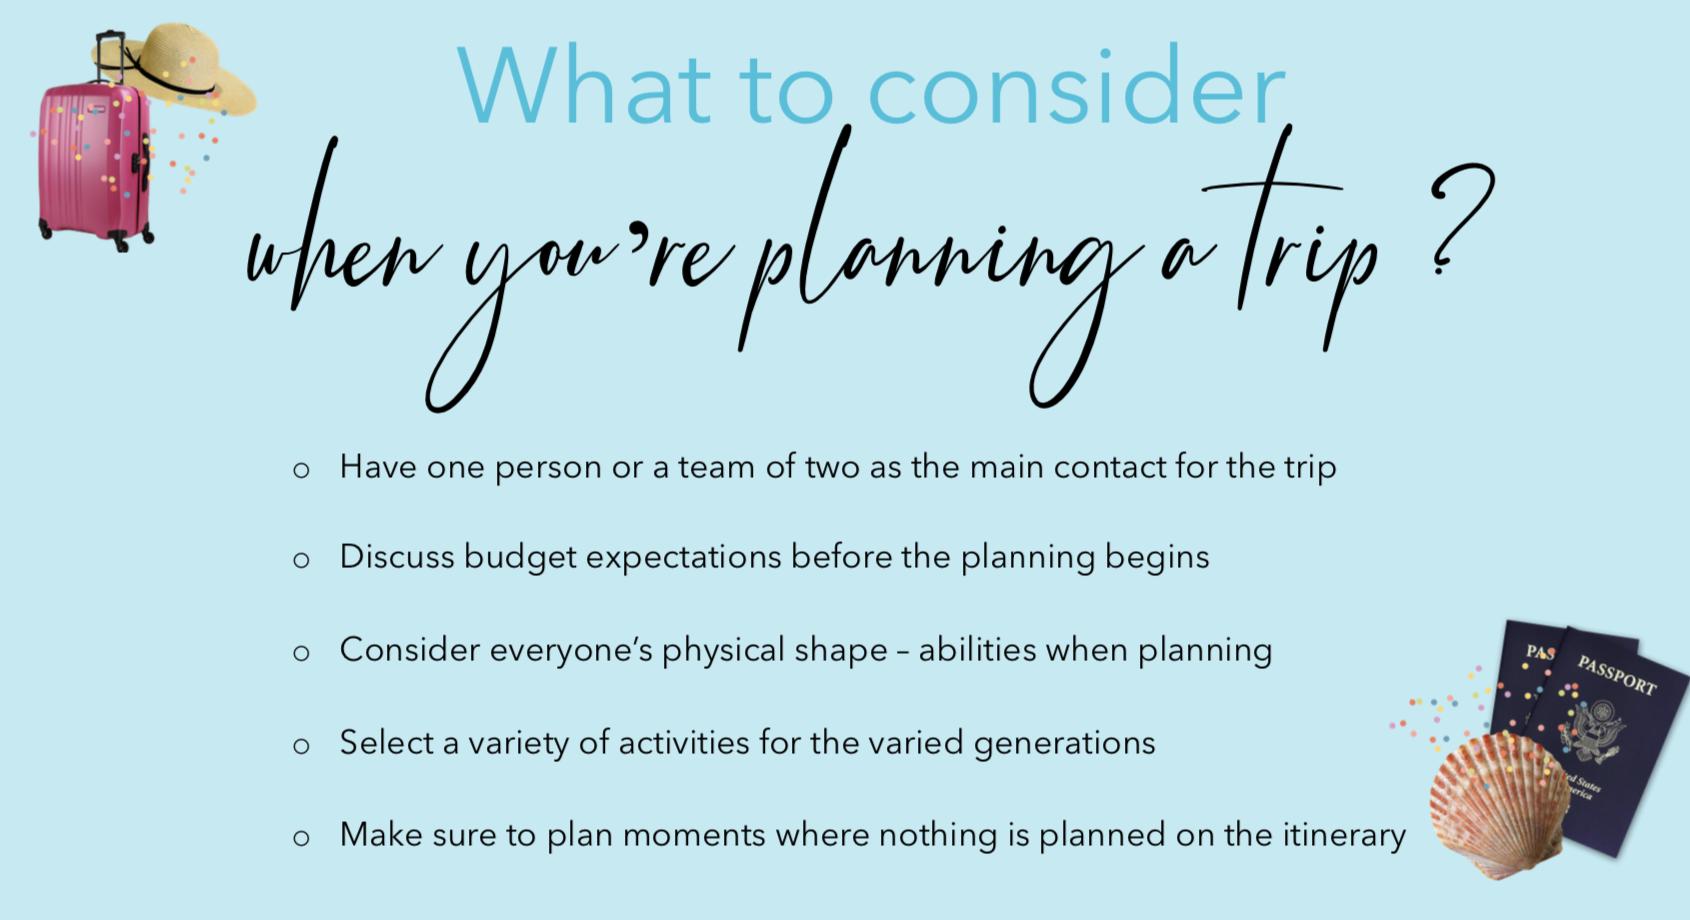 multigenerational travel - travel - trip planning